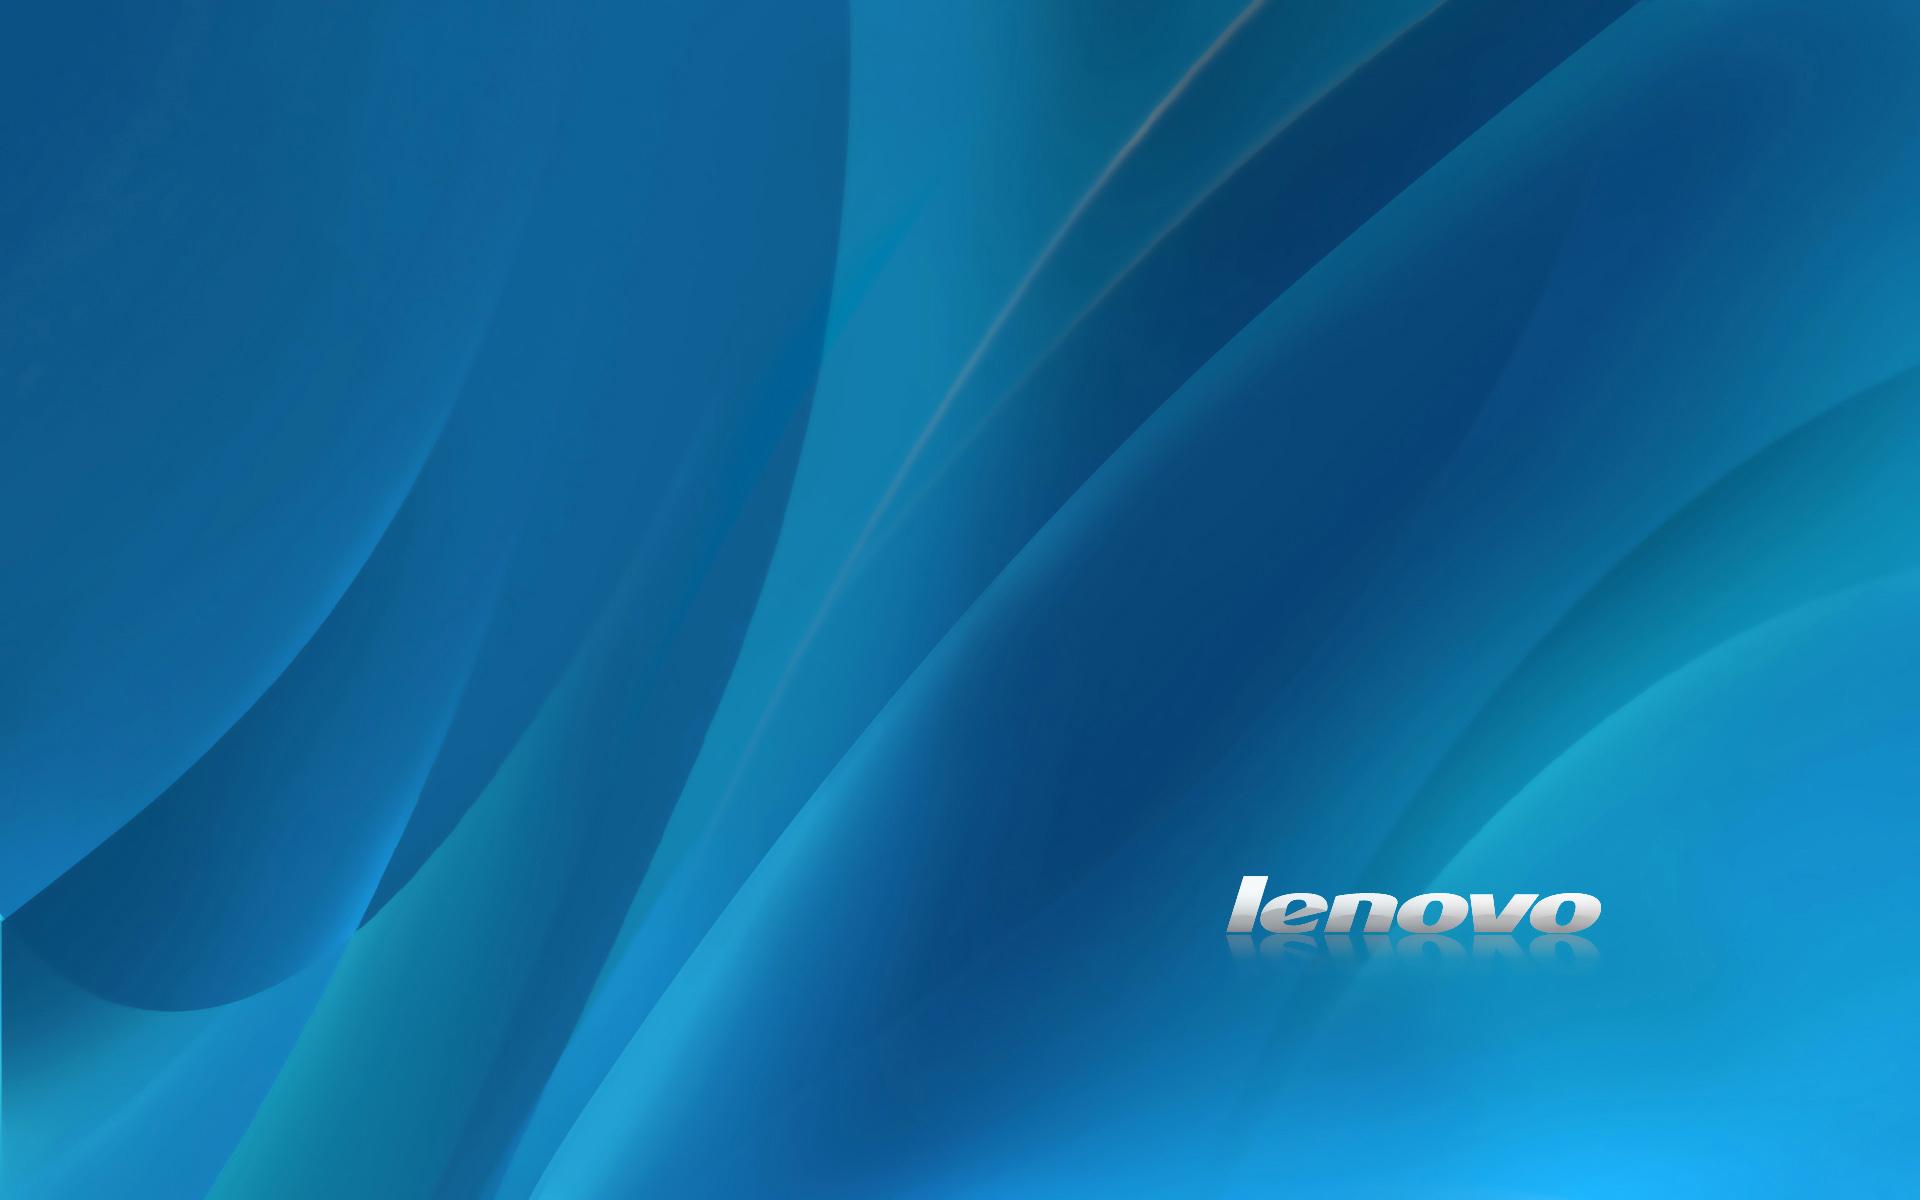 Lenovo Wallpaper Lenovo Wallpaper 1920x1200